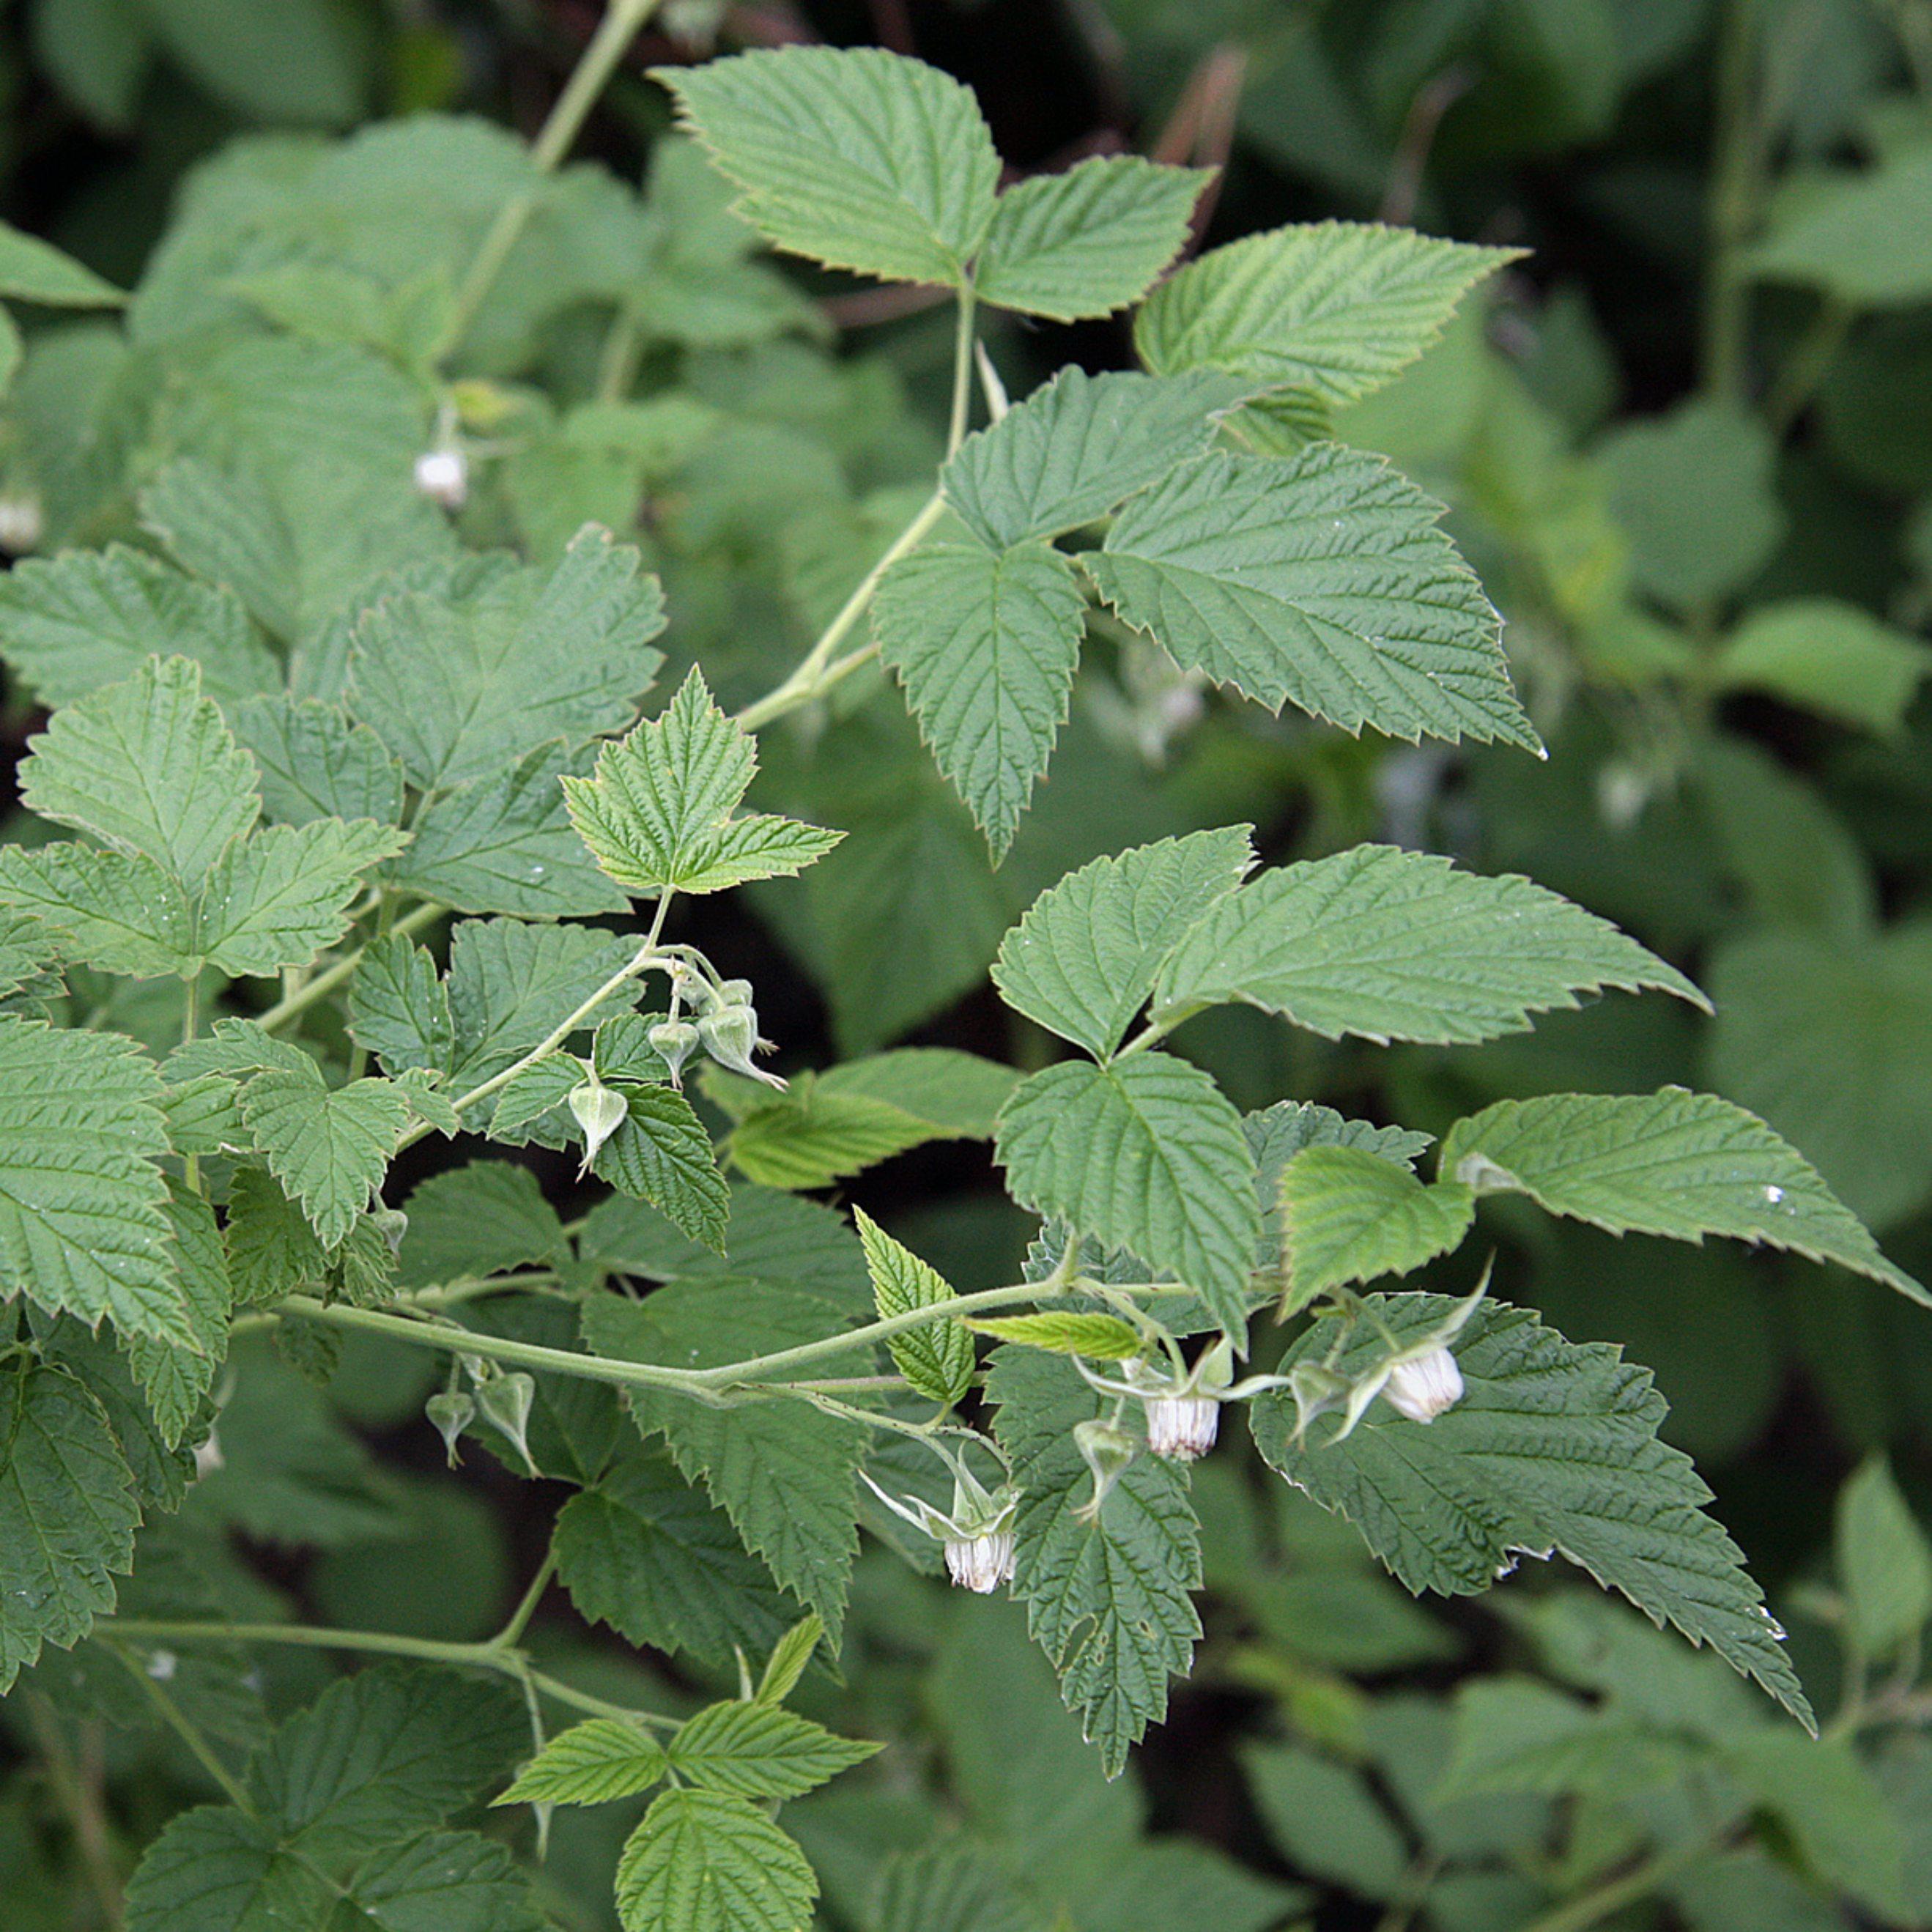 European raspberry leaves organic wild collection